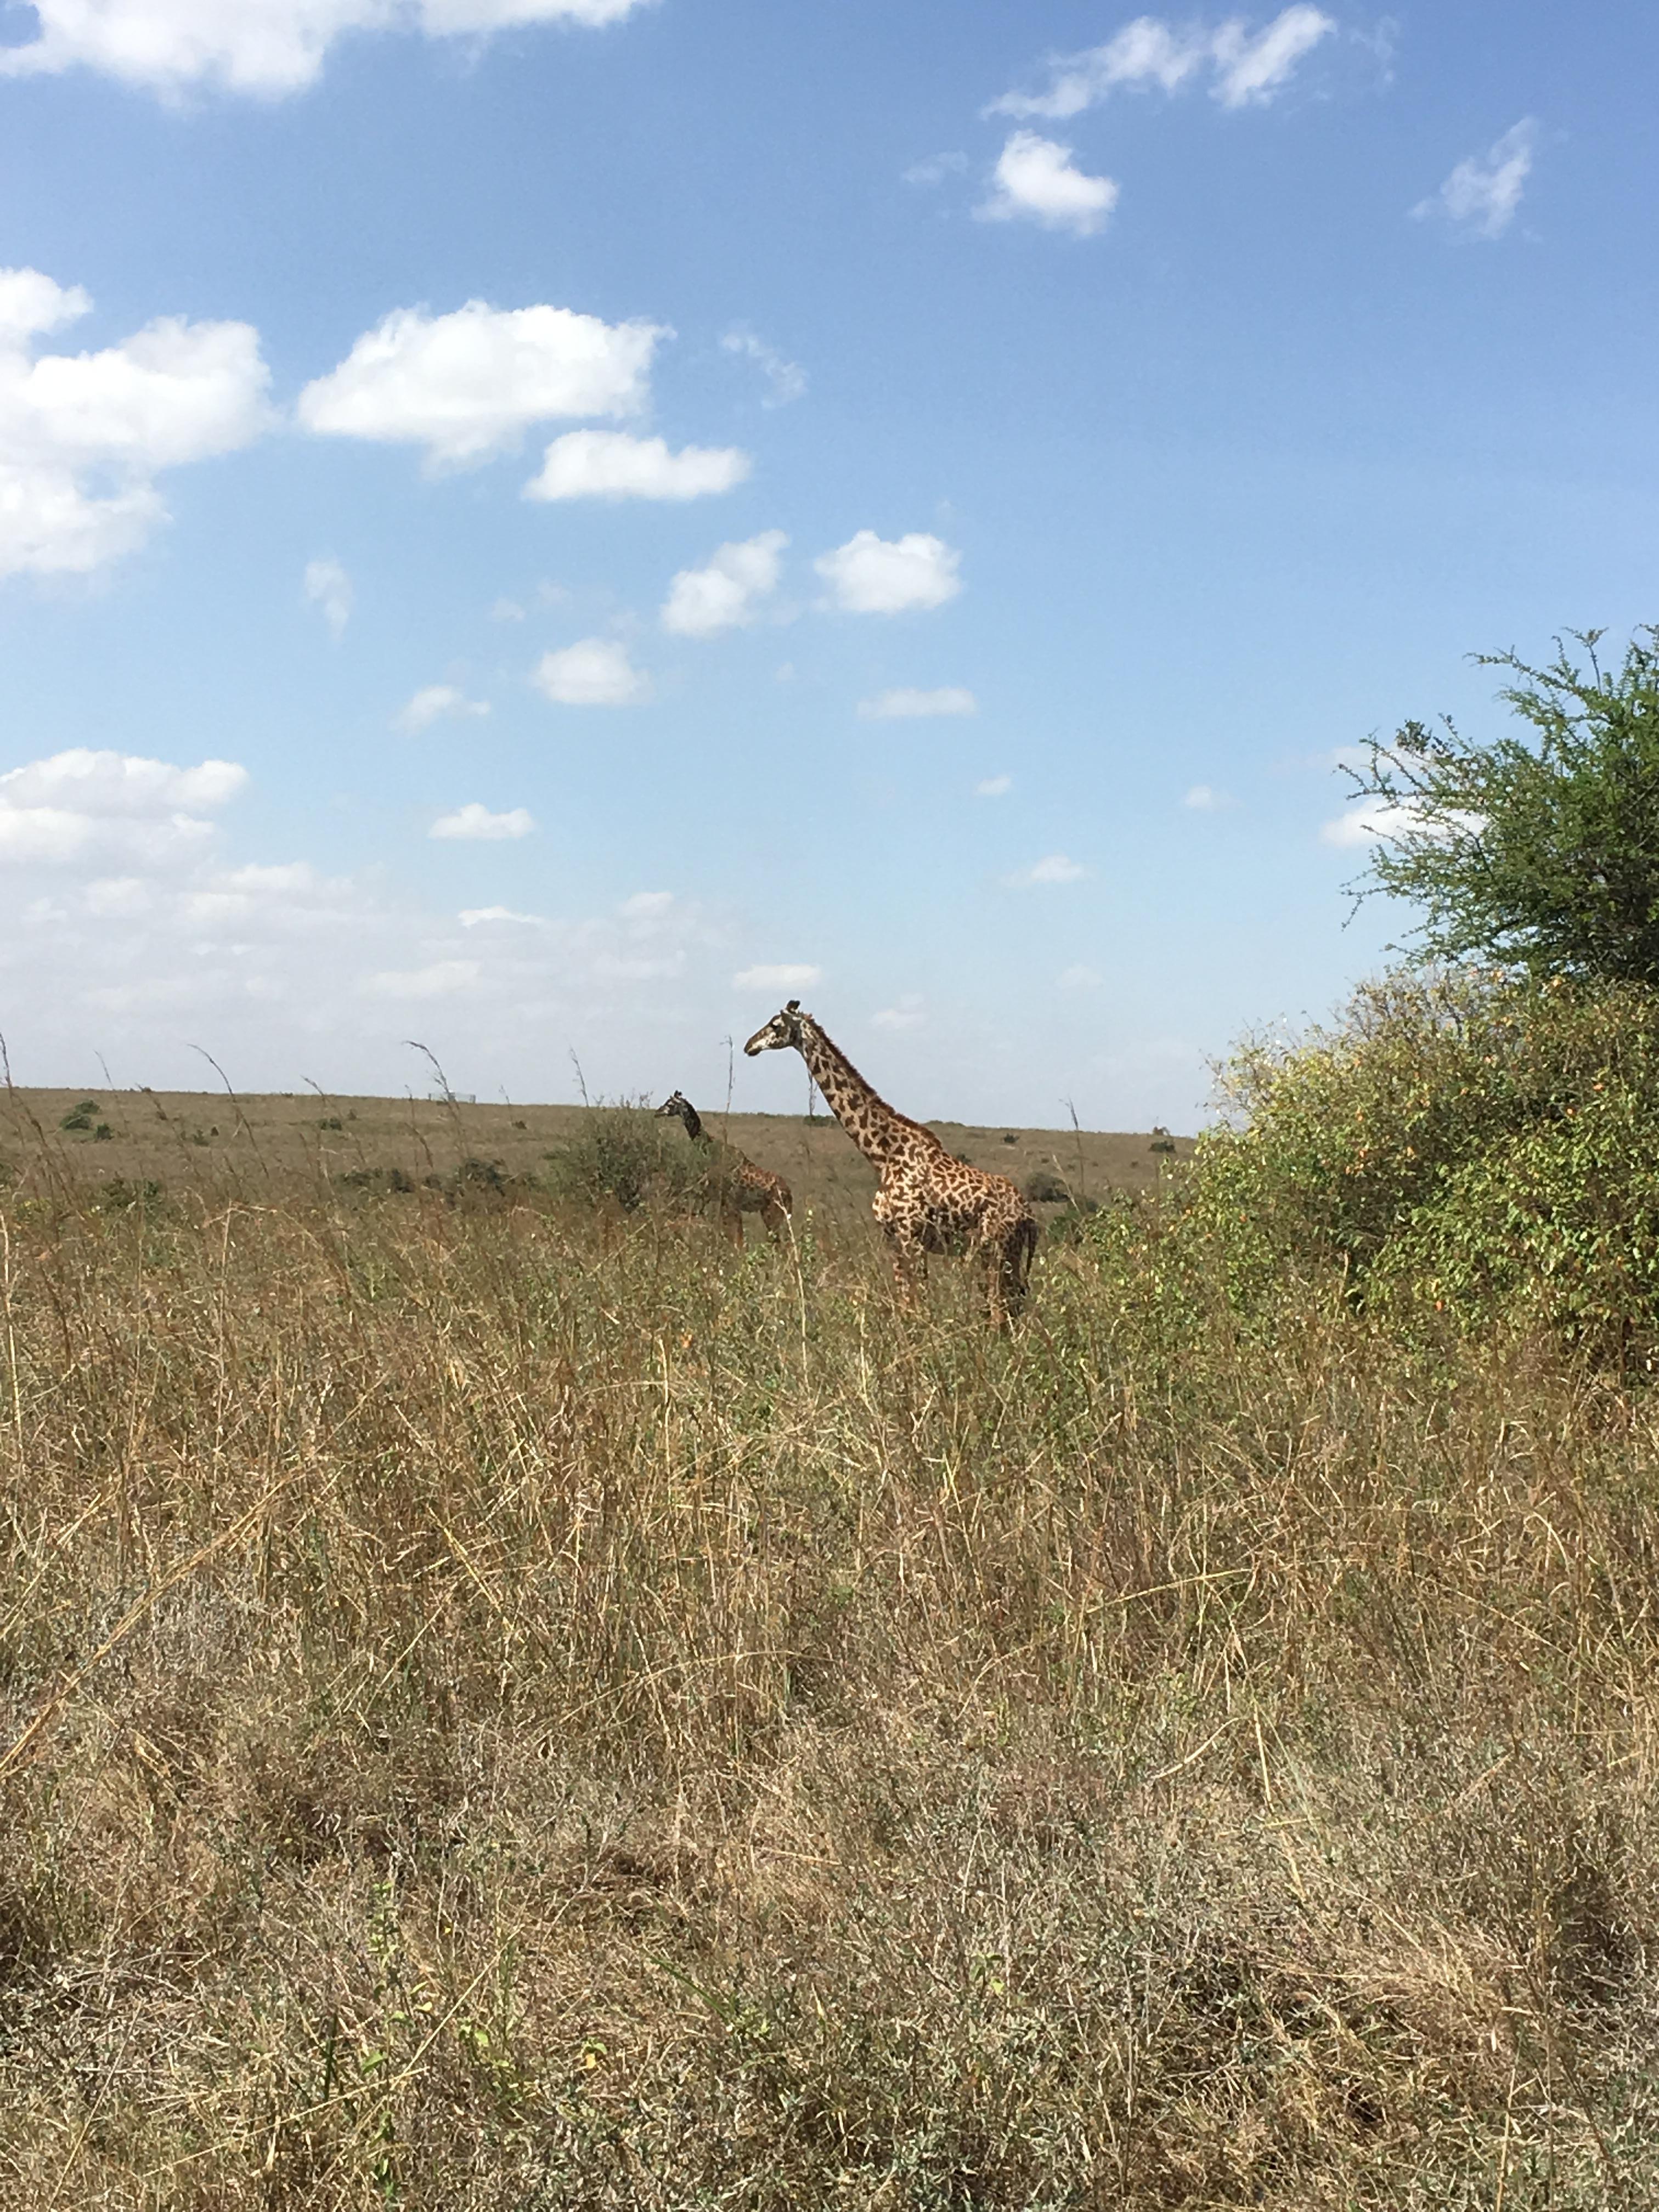 Giraffe in national park